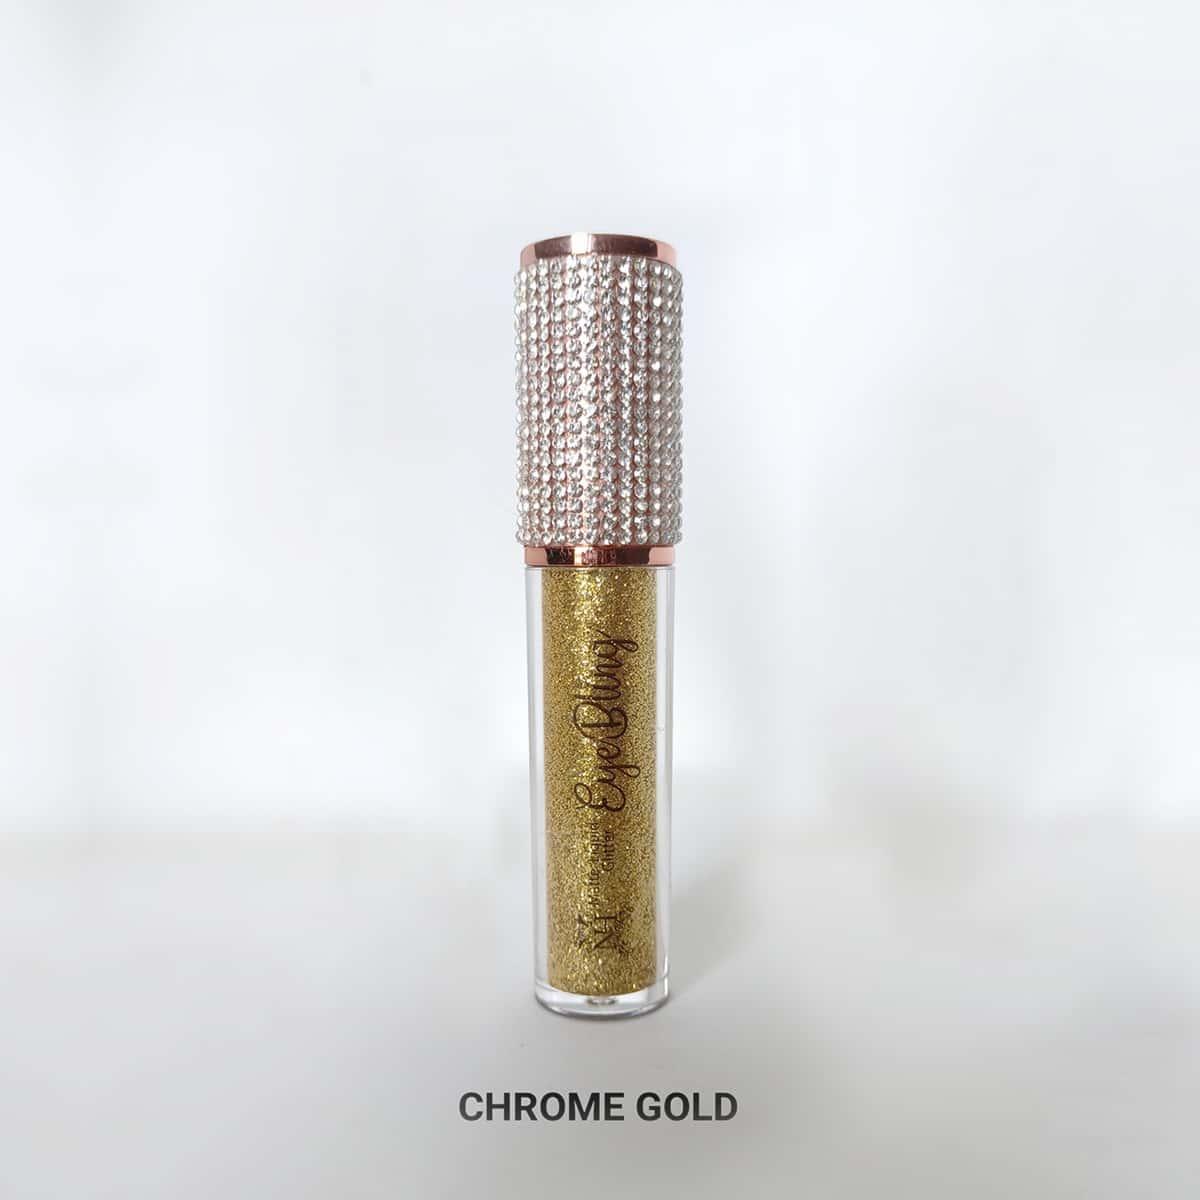 chrome_gold-8Cv6cAgs